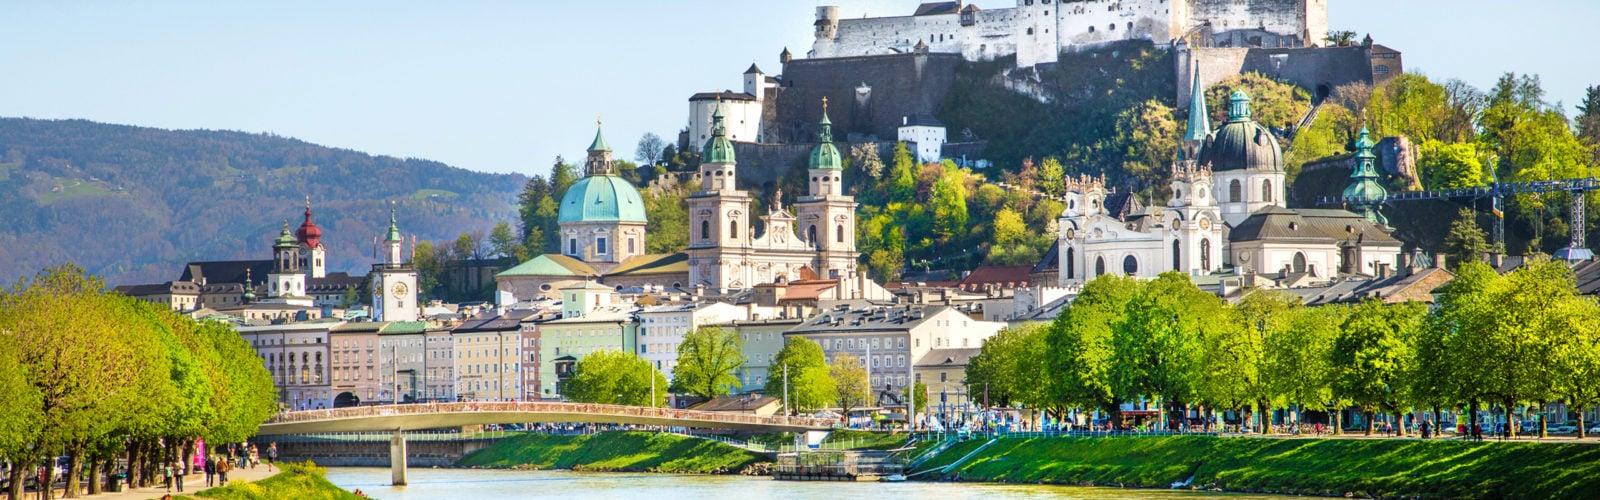 salzburg-skyline-festung-hohensalzburg-austria